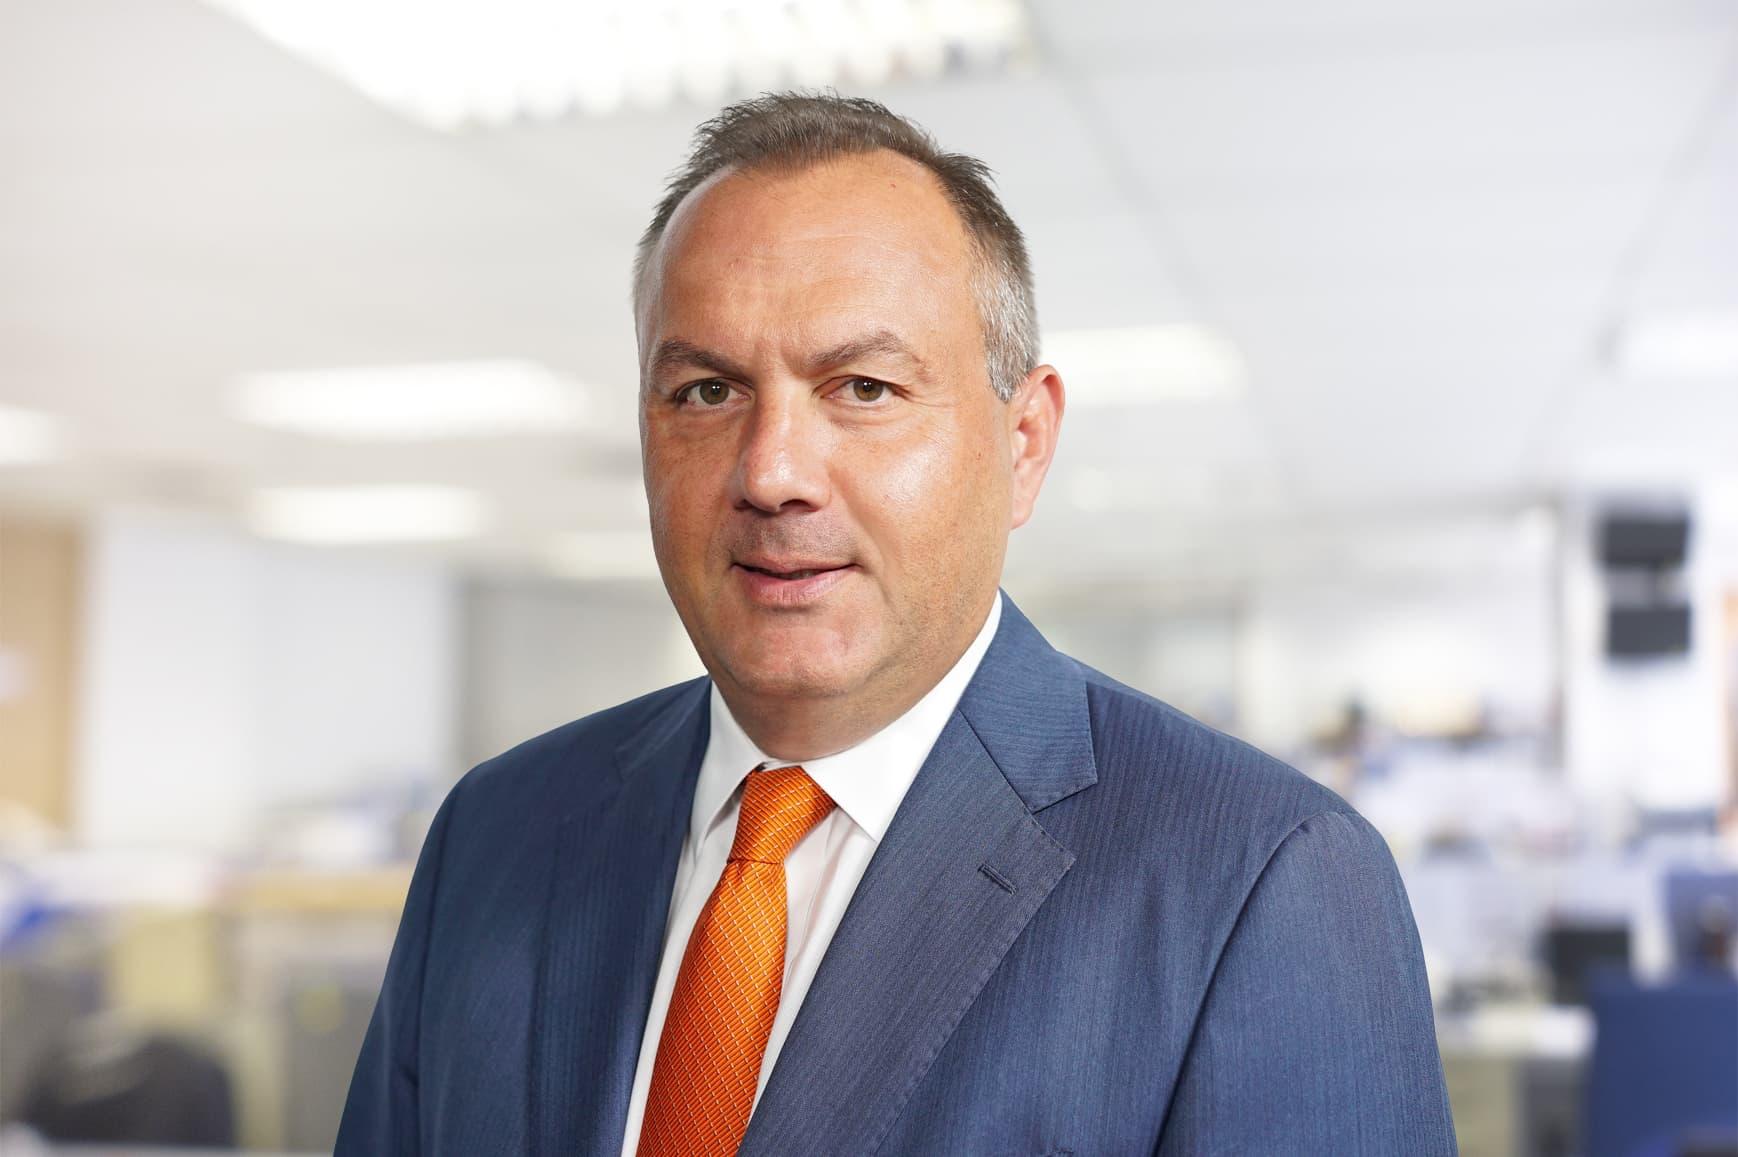 Dave Bohn, Managing Director, Equity Capital Markets